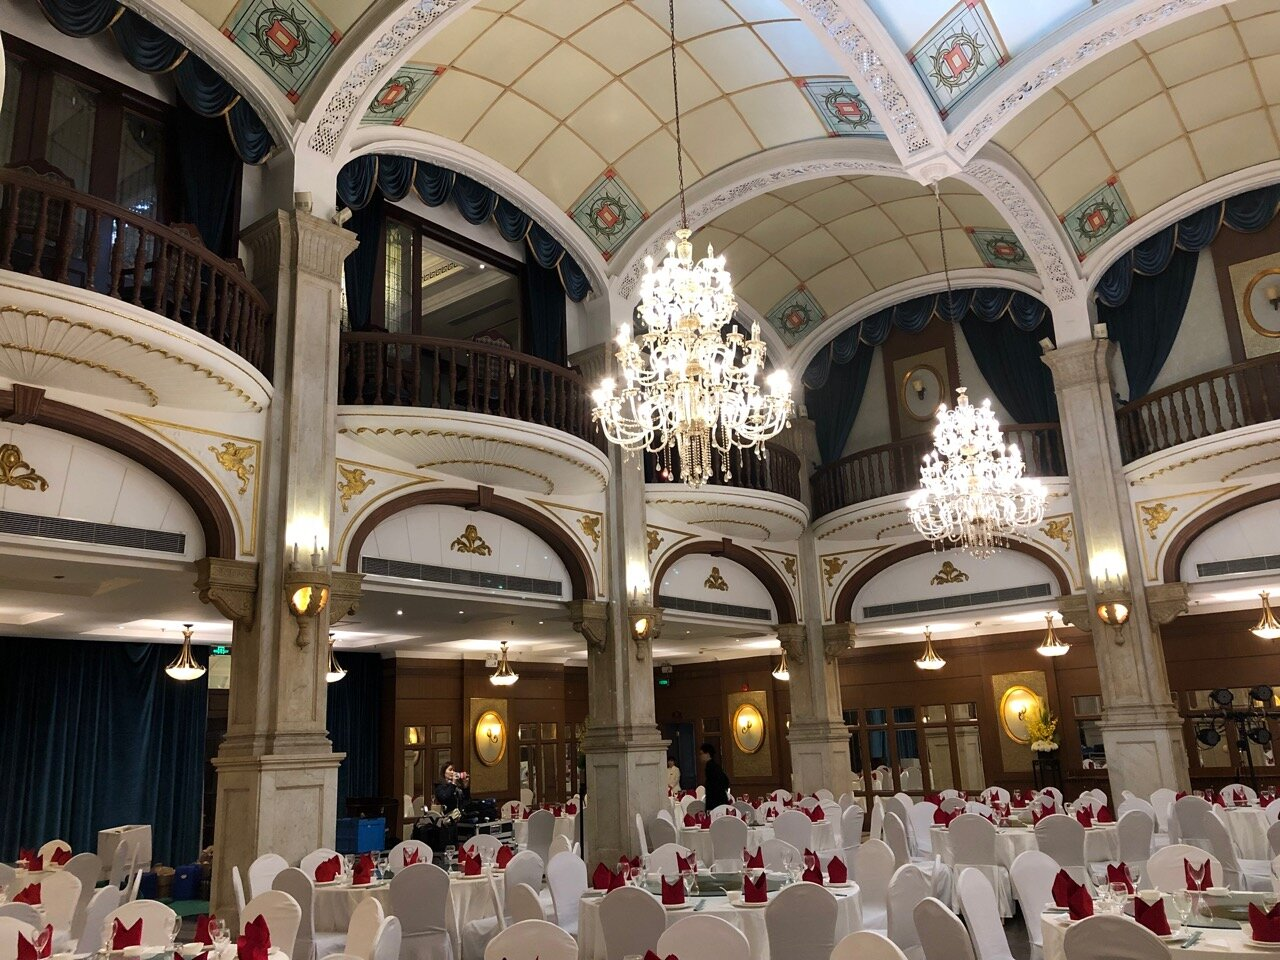 Ground floor ballroom with Arabesque ceiling